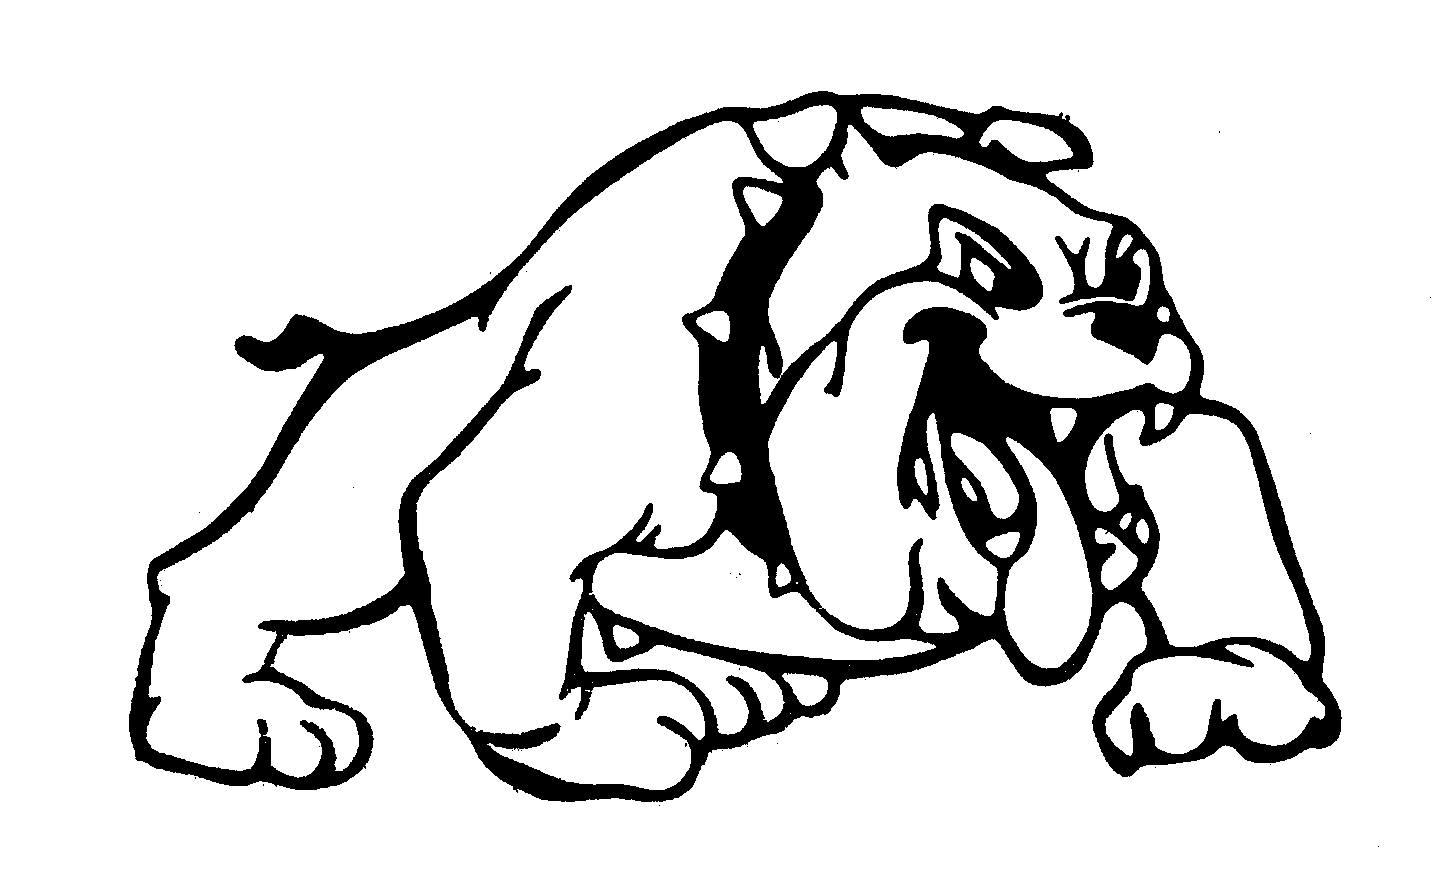 Bulldog Mascot Clipart Clipar - Bulldog Mascot Clipart